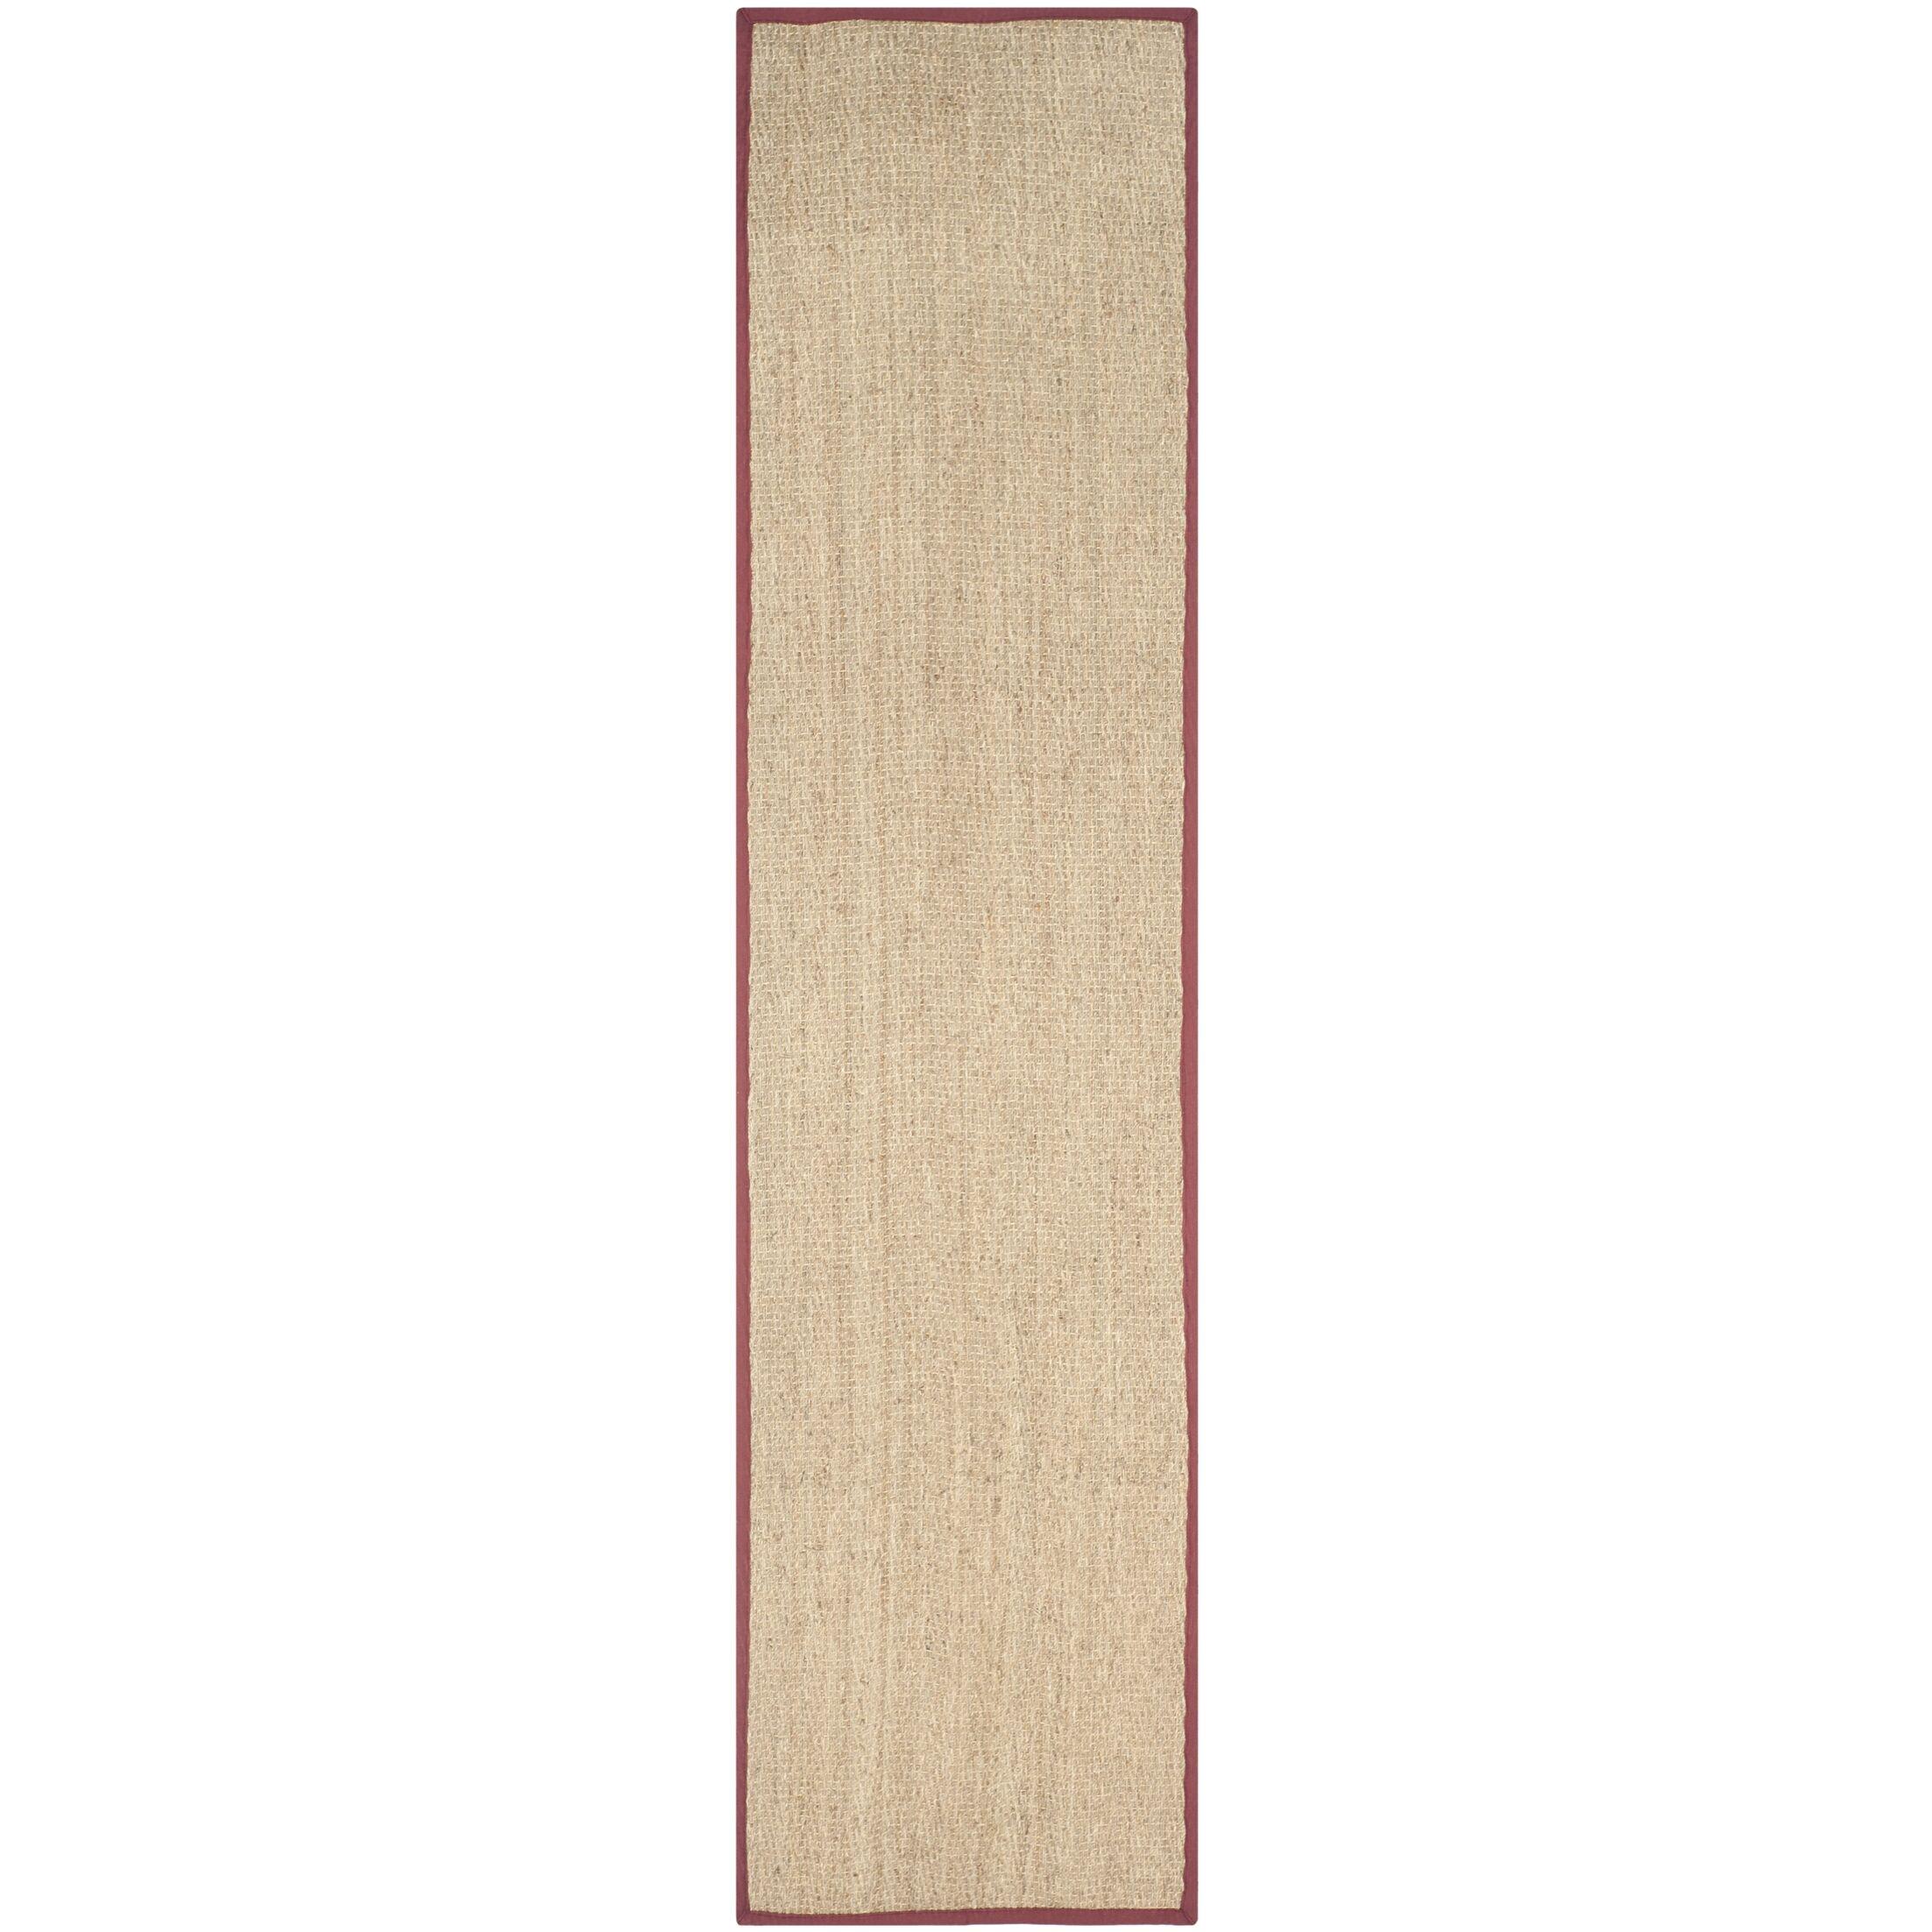 Eldert Natural Fiber Hand-Woven Brown/Tan/Red Area Rug Rug Size: Runner 2'6